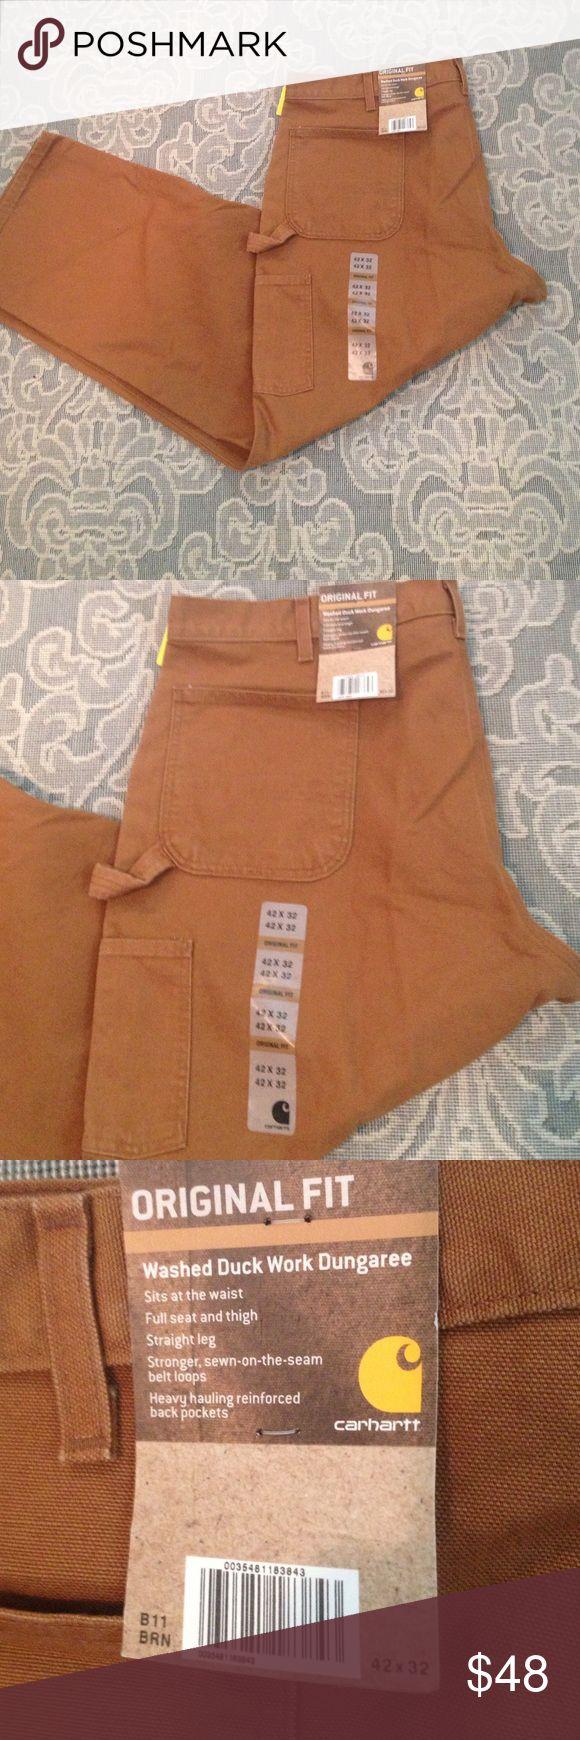 "New Men's Carhartt Work Pant New Men's Carhartt Work Pant , Original Fit , 32"" Inseam Carhartt Pants"